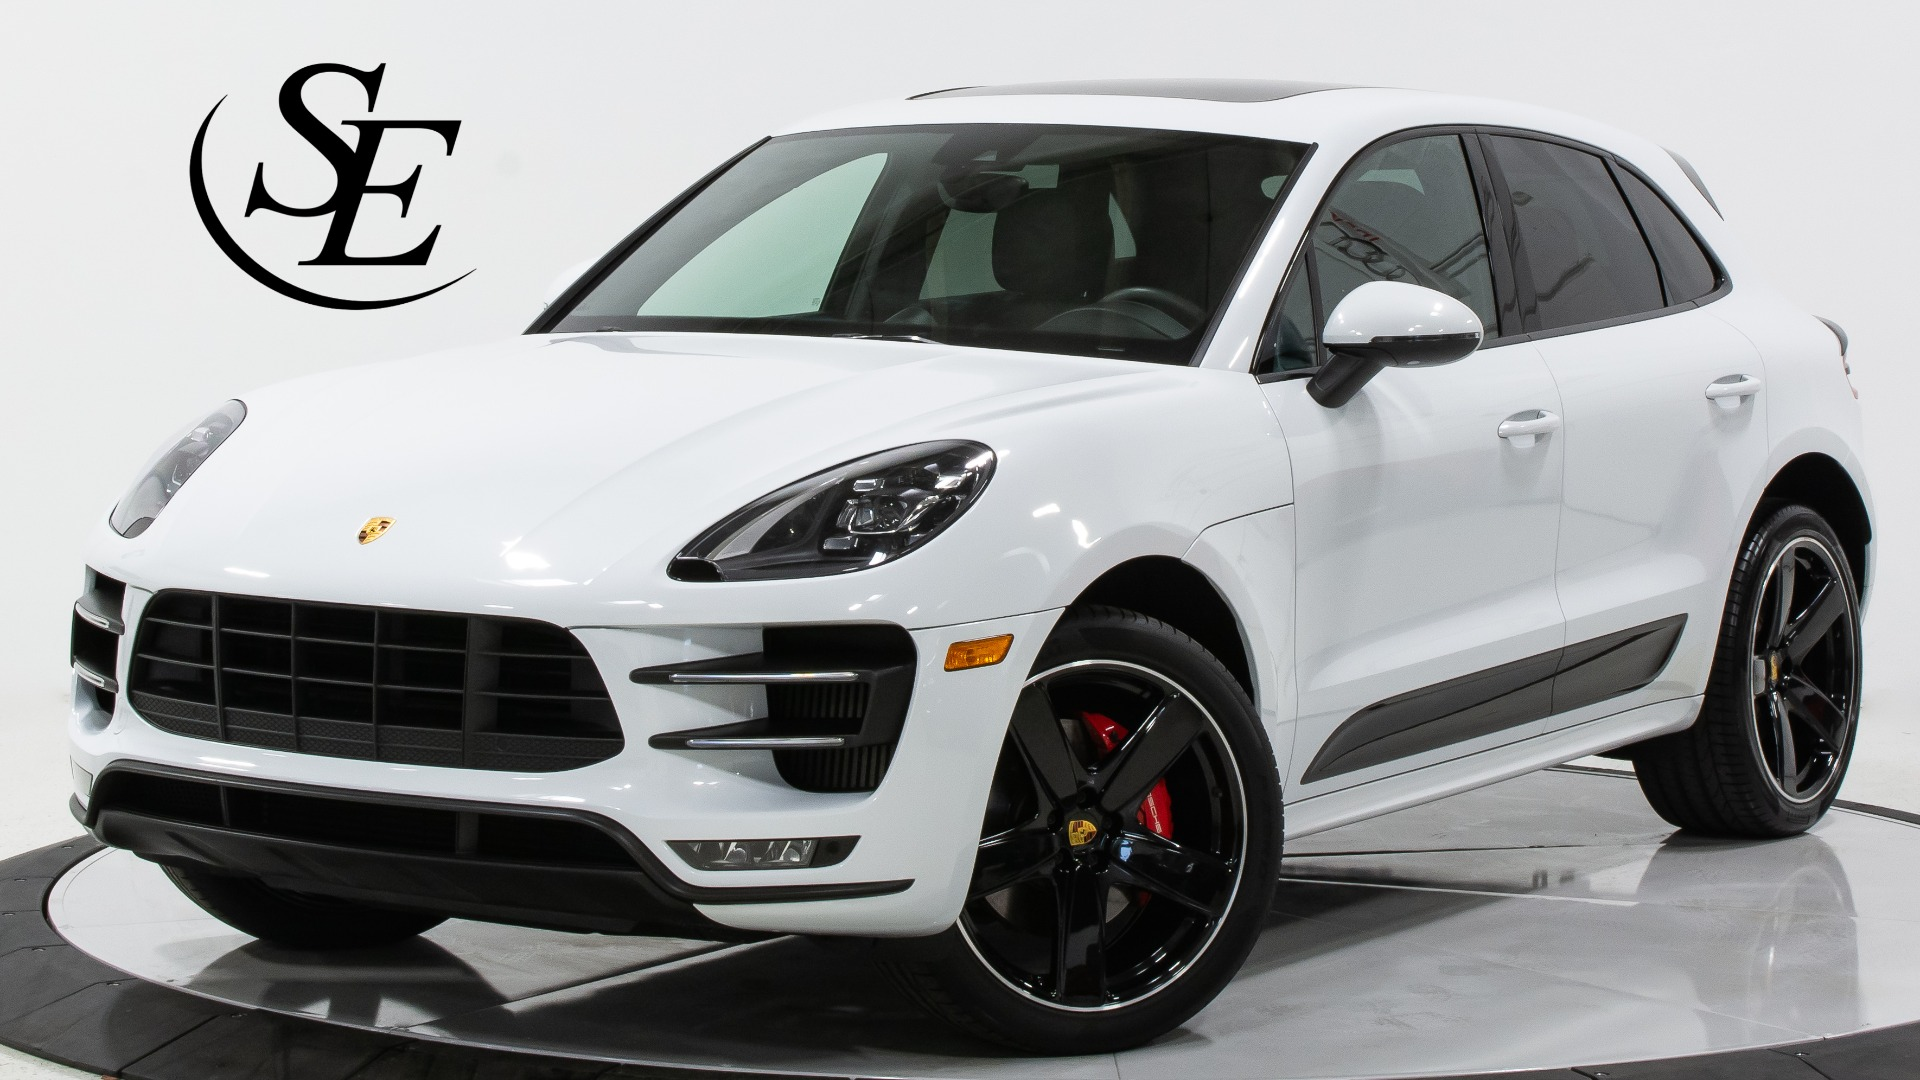 2017 Porsche Macan Turbo Sold Stock 22834 For Sale Near Pompano Beach Fl Fl Porsche Dealer